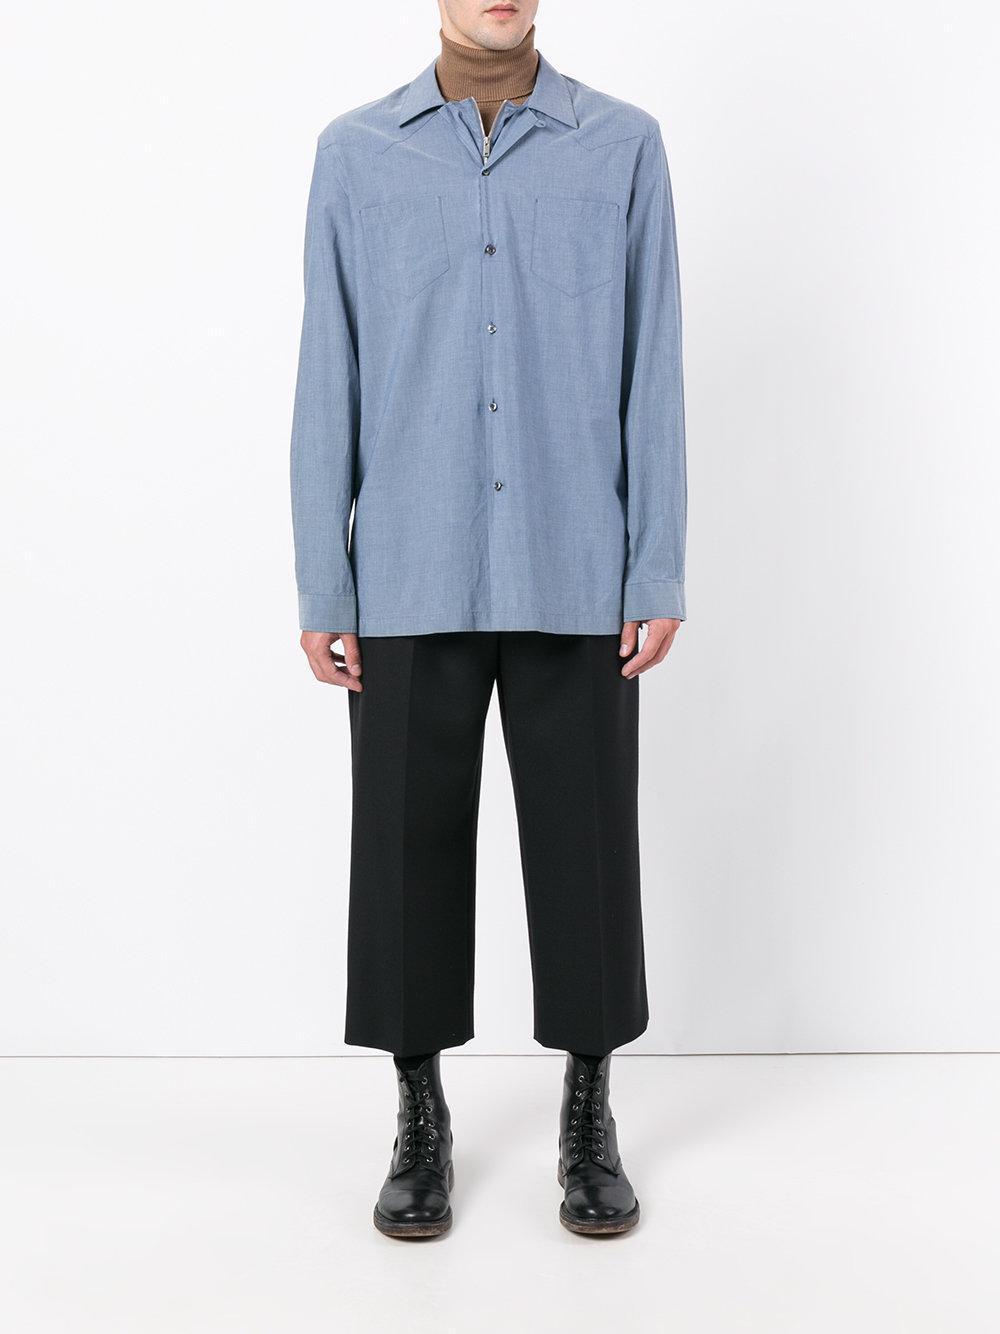 Maison Margiela Cotton Western Style Oversized Shirt in Blue for Men